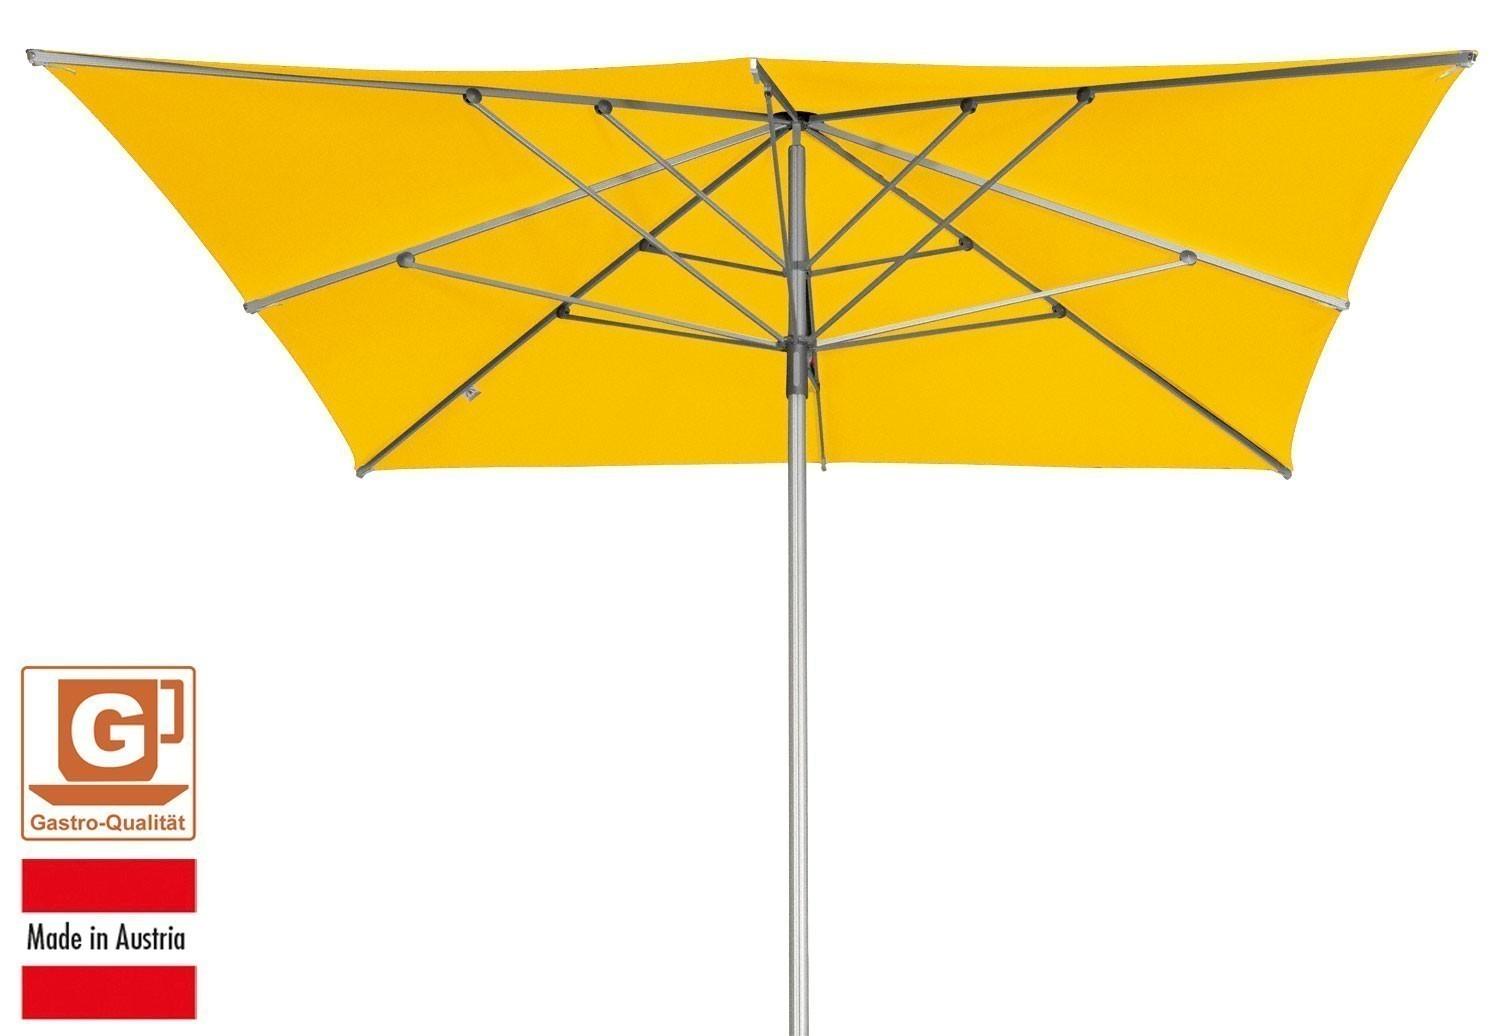 gro schirm sonnenschirm doppler alu expert 350x350cm gelb bild 1. Black Bedroom Furniture Sets. Home Design Ideas